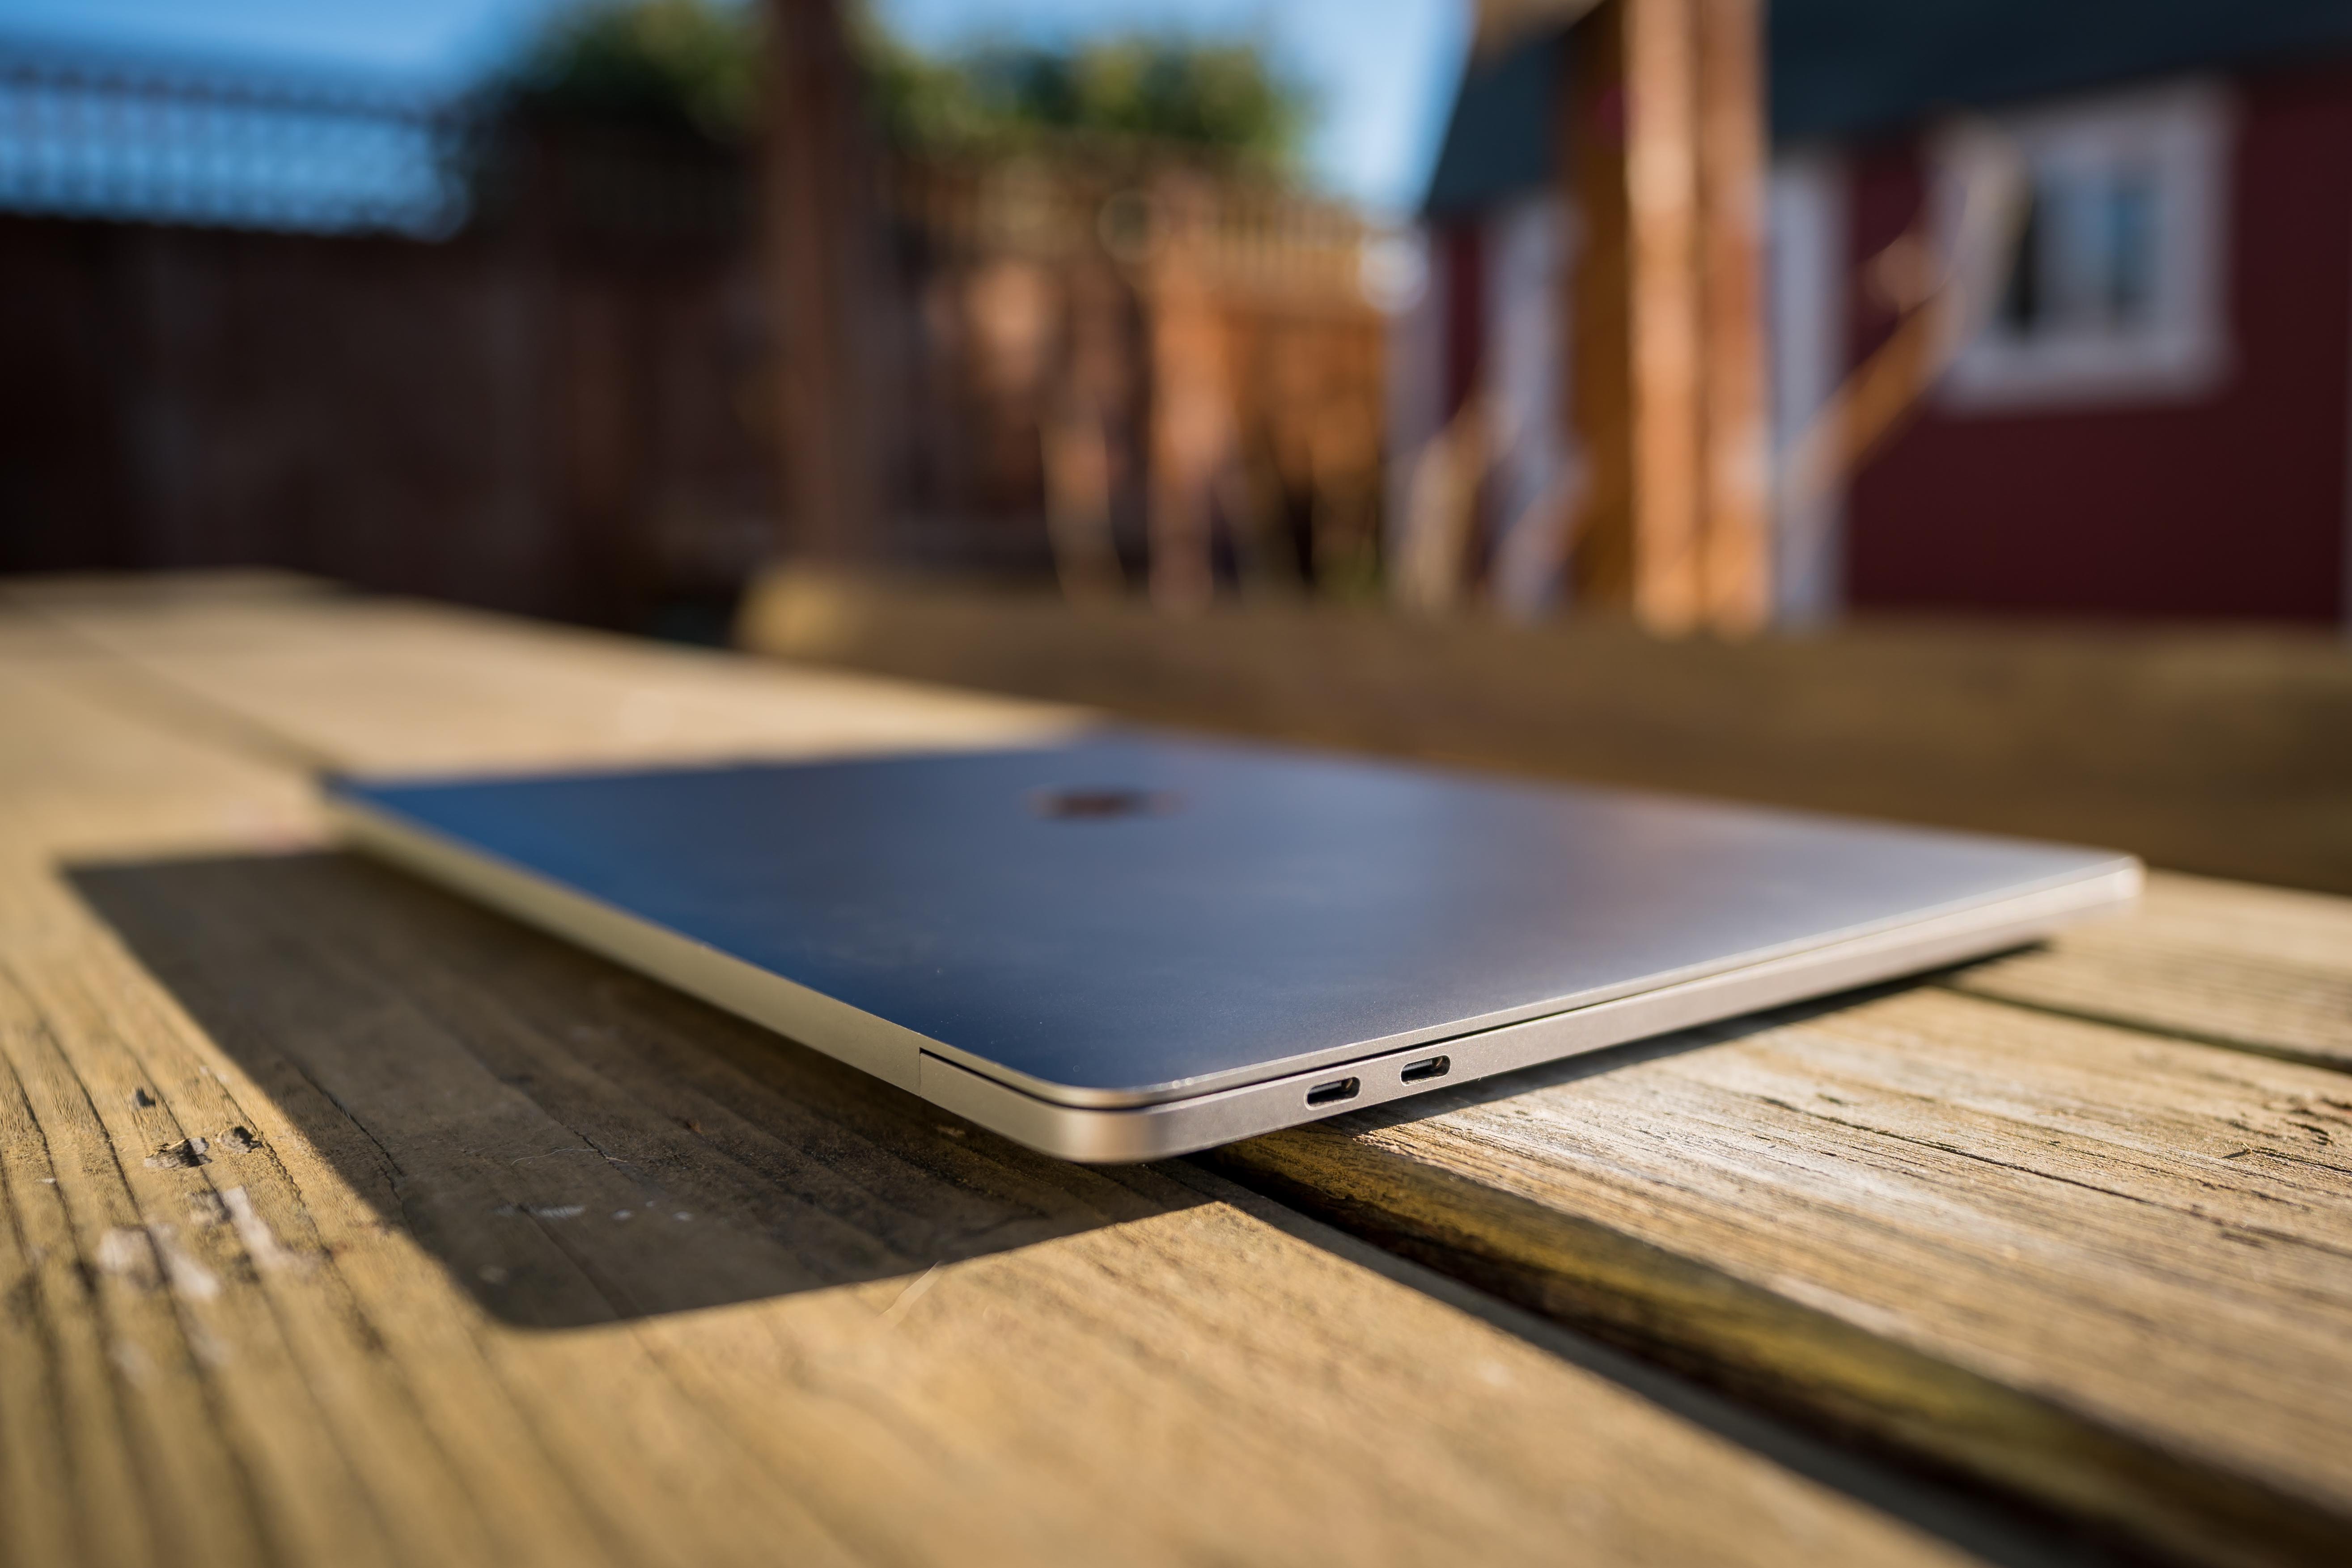 MacBook Pro 2019 in 16 Zoll: Fast perfekt, doch das fehlt dem Apple-Notebook